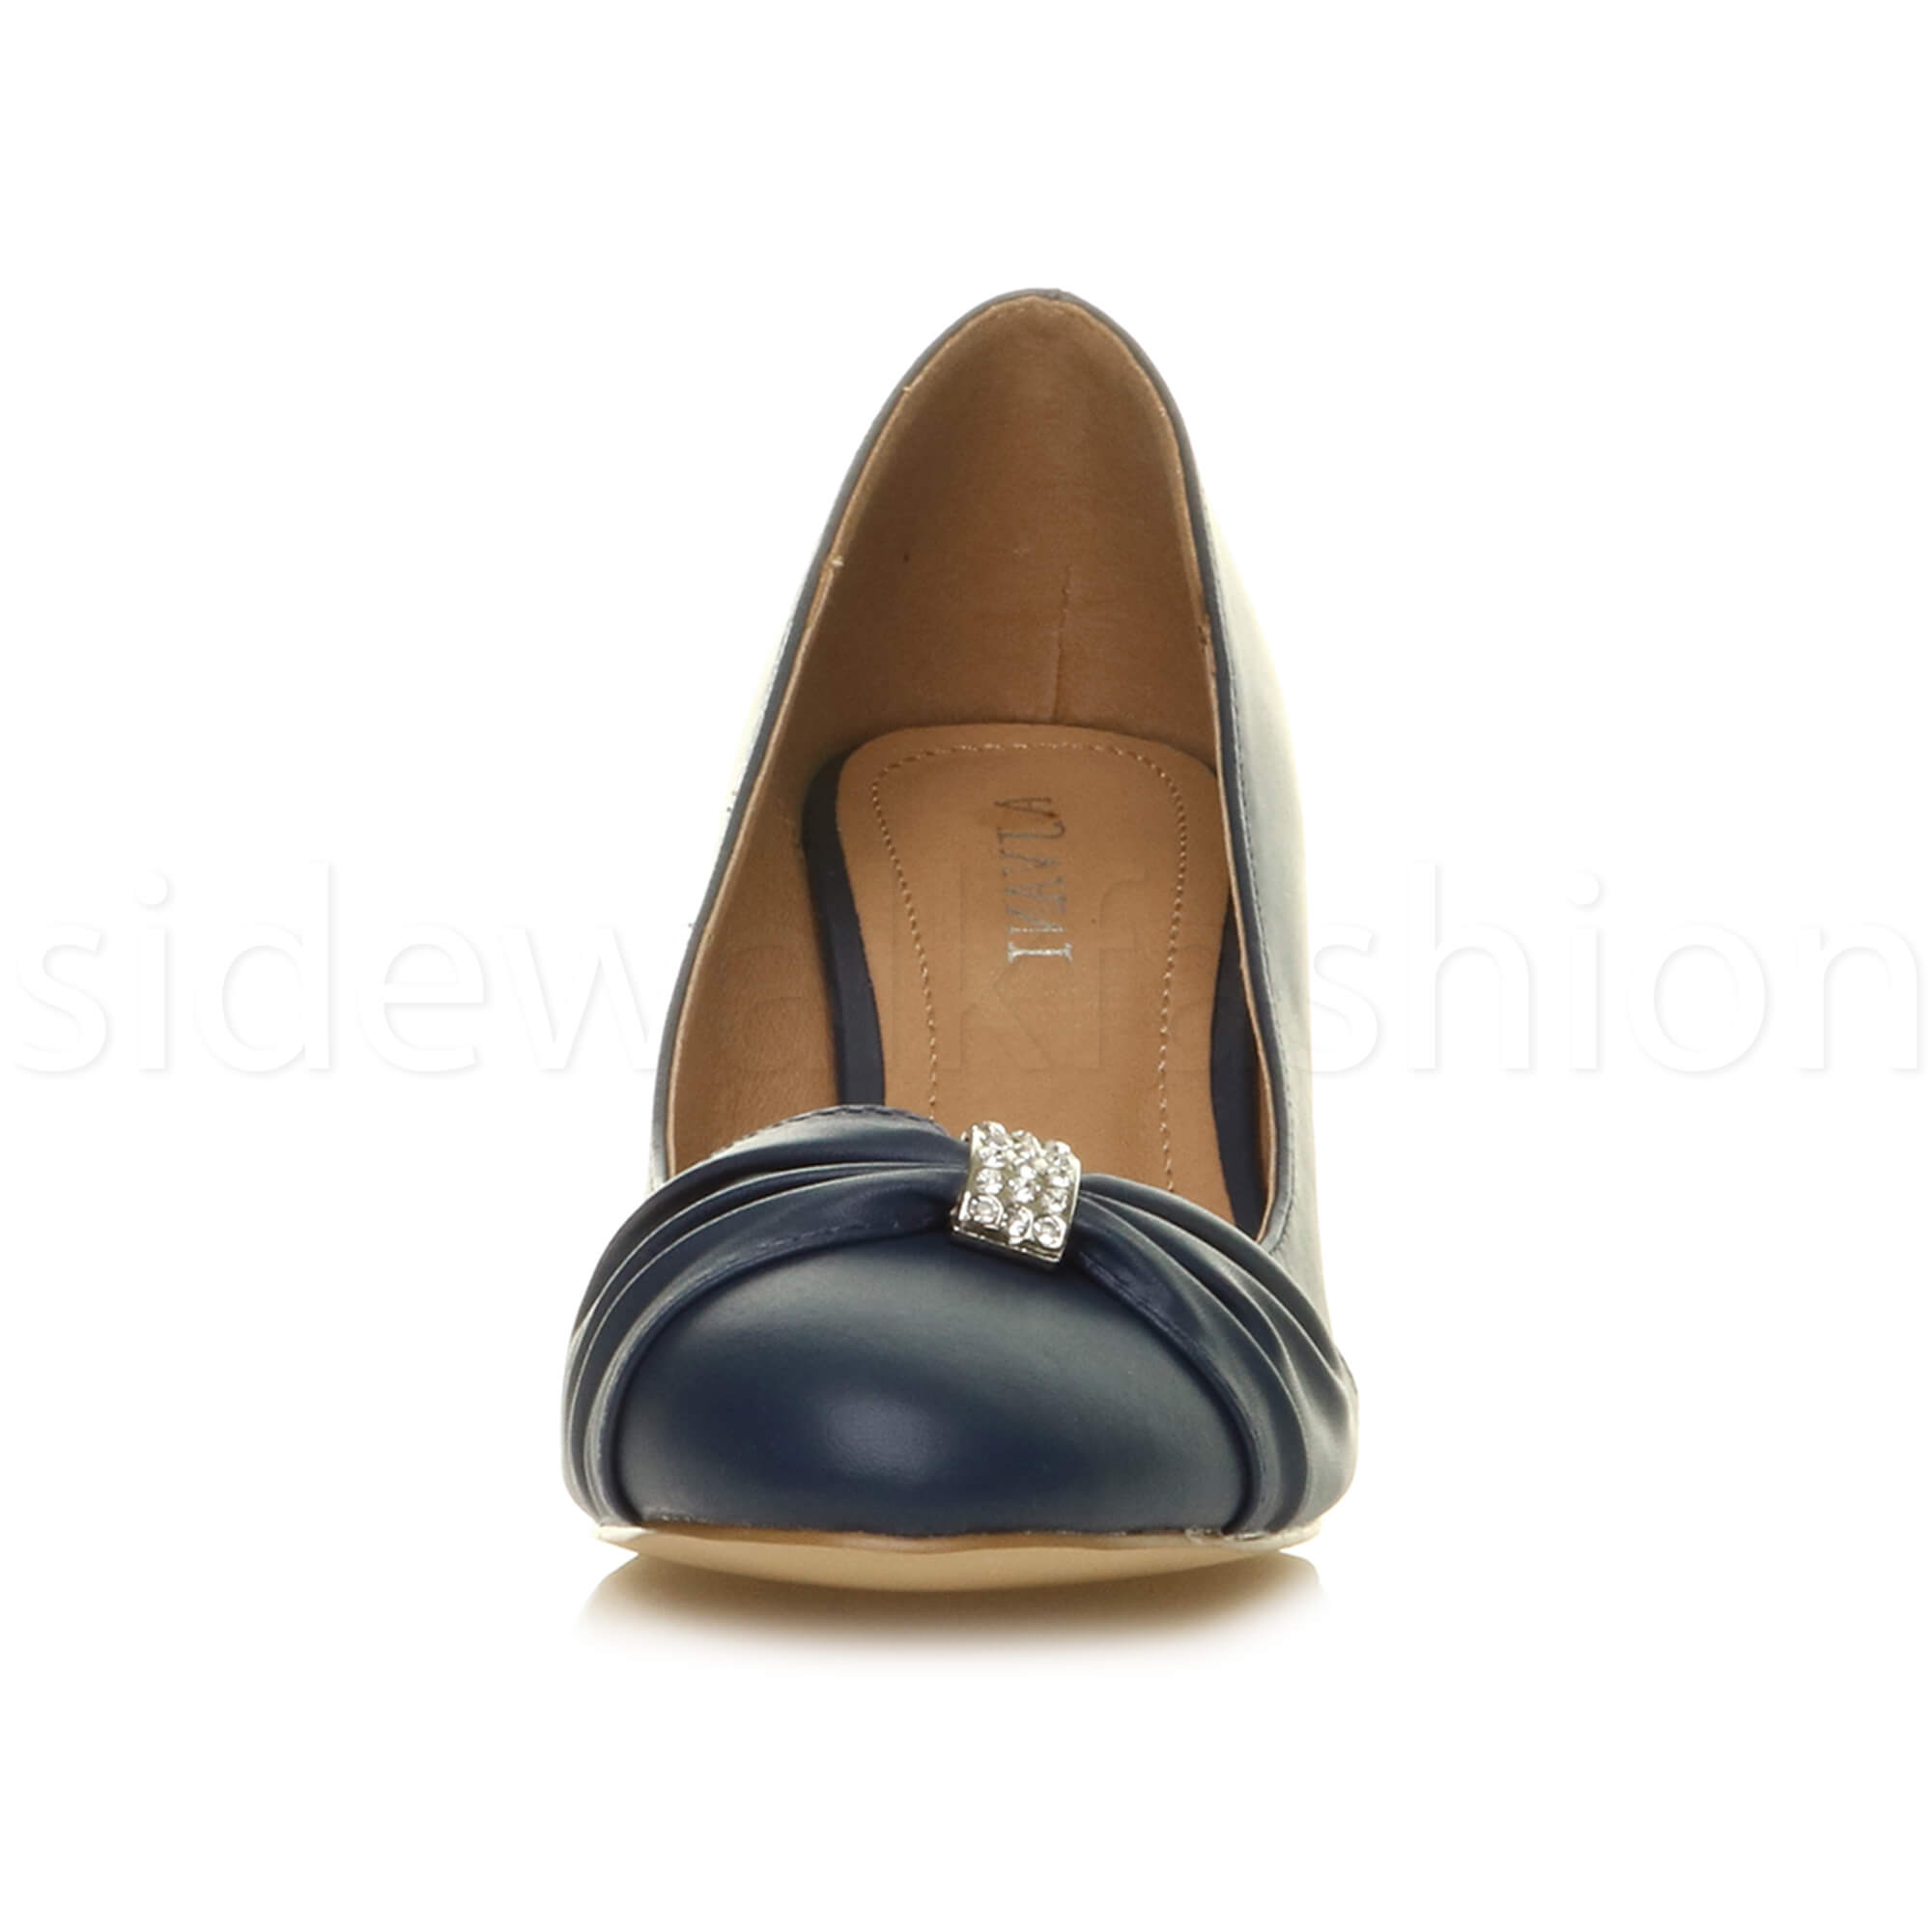 Womens-ladies-low-mid-heel-diamante-party-smart-evening-court-shoes-size thumbnail 47